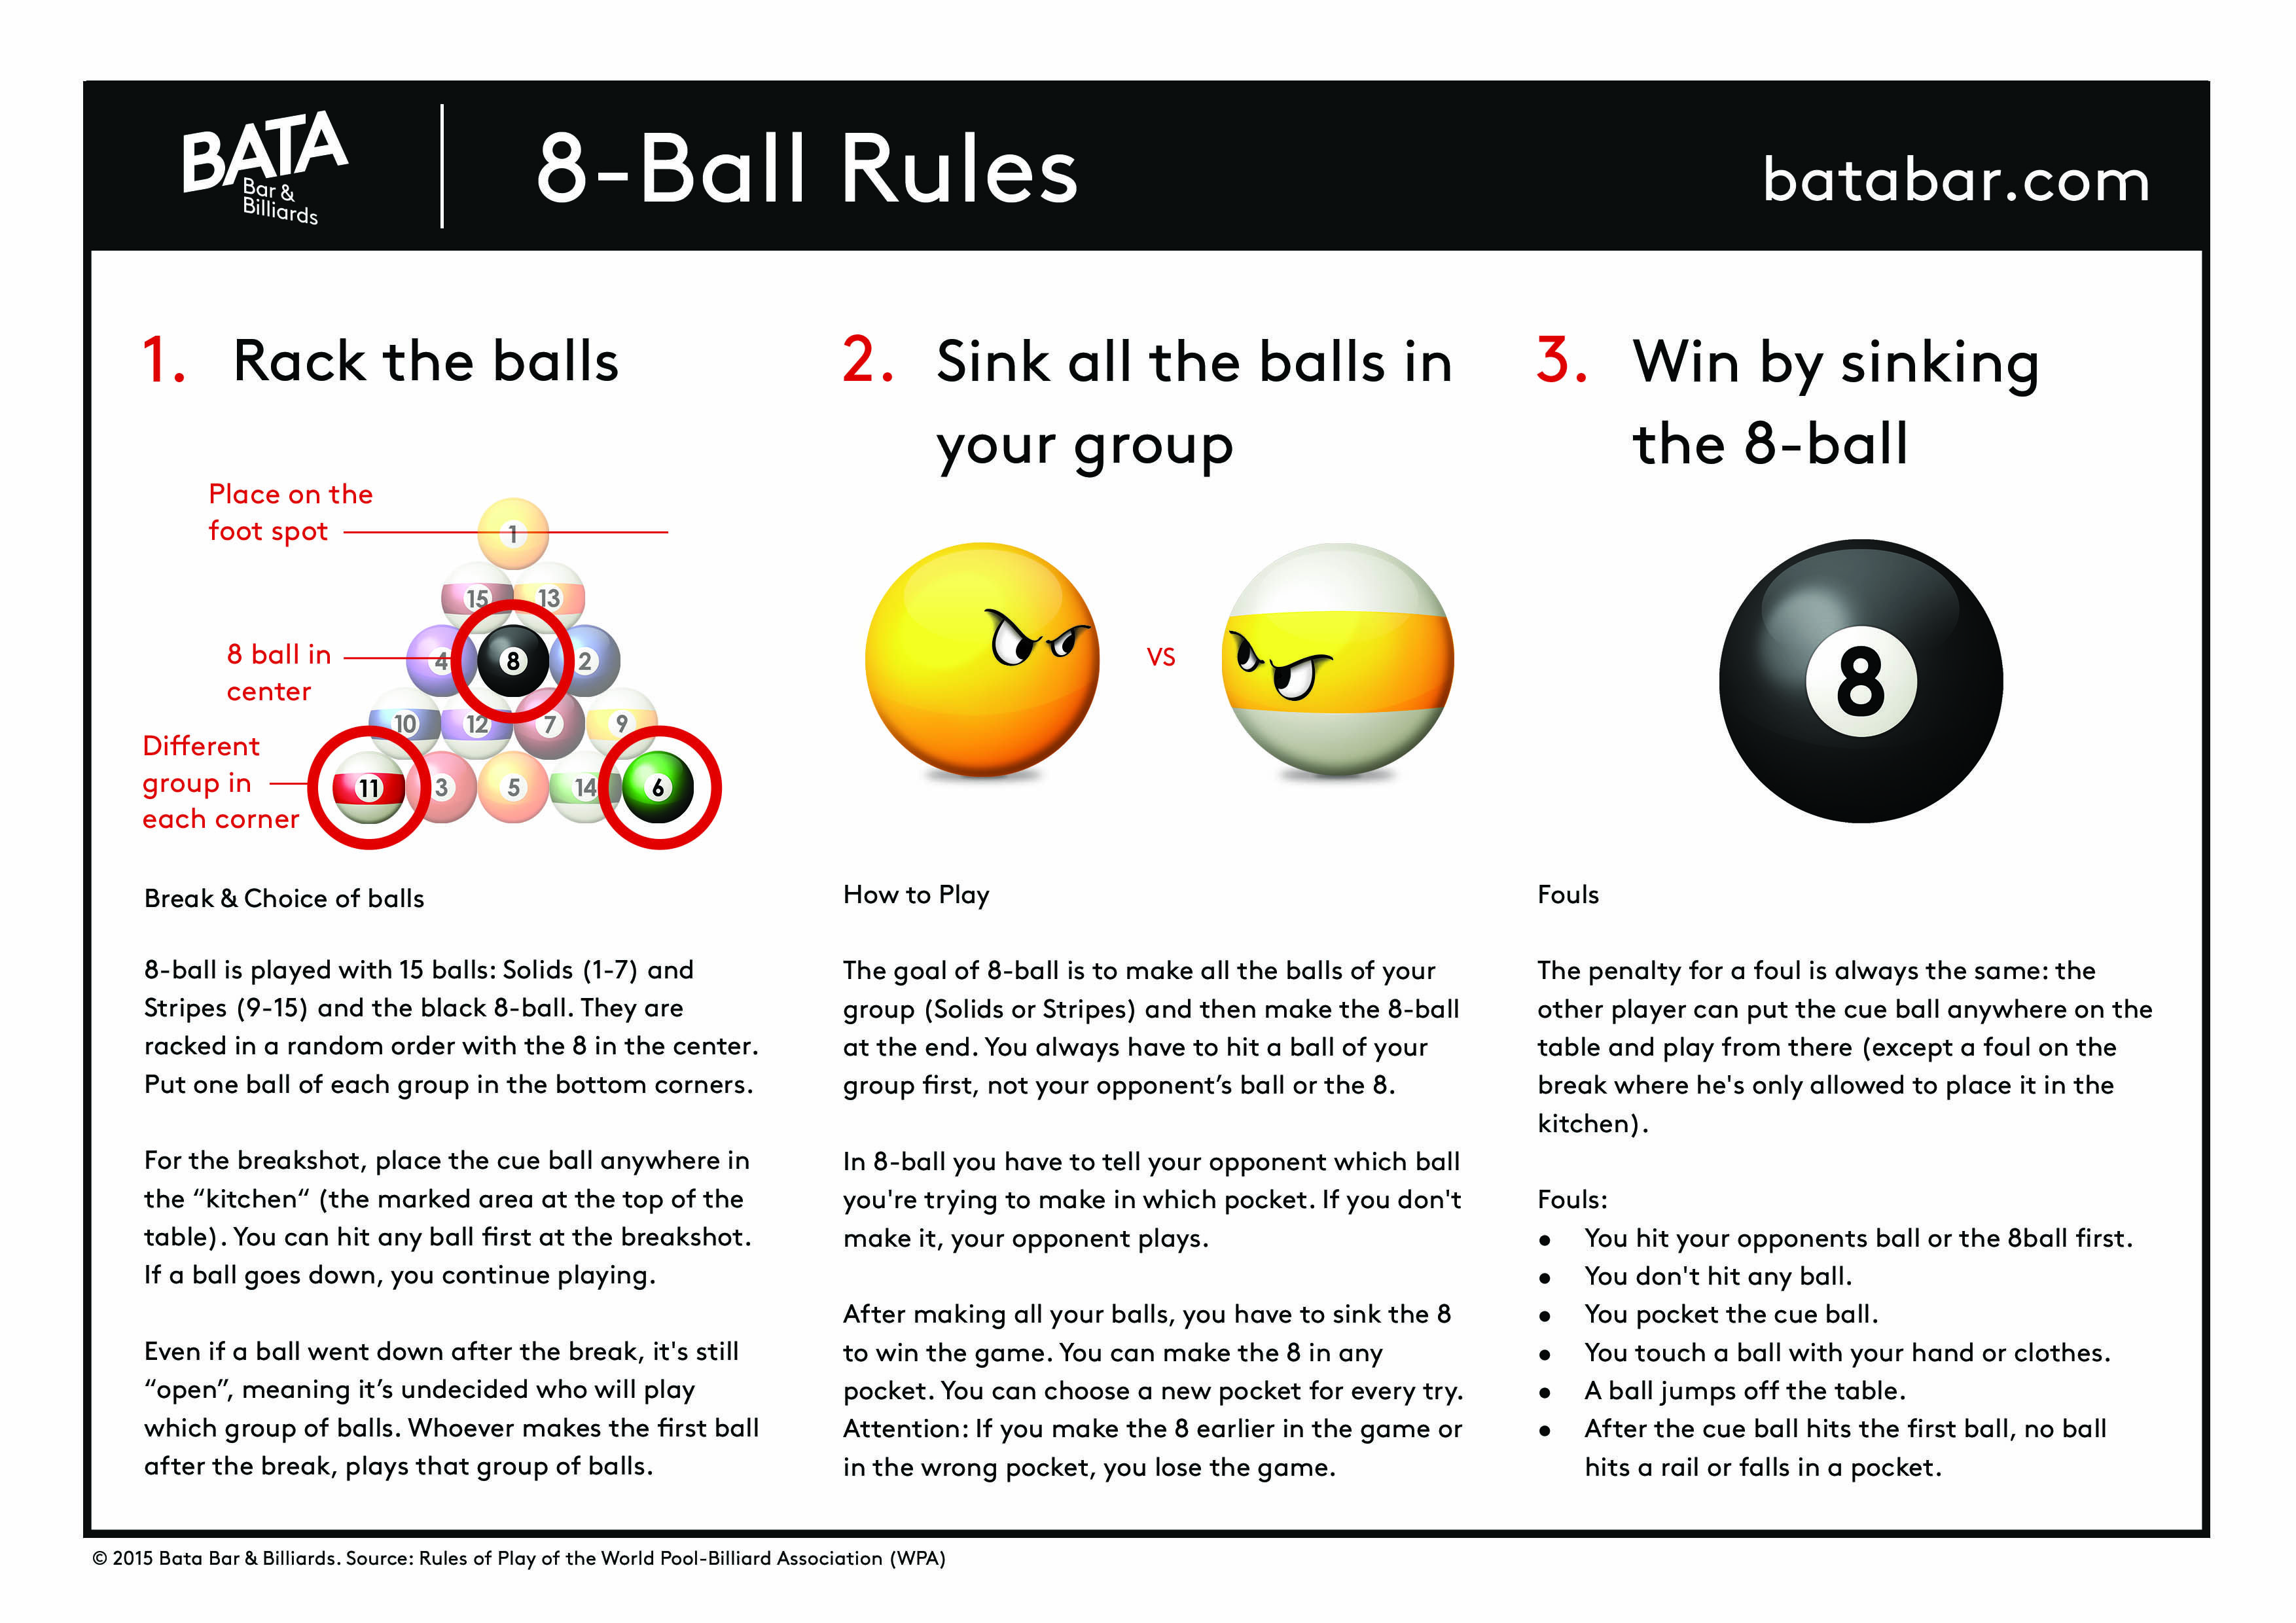 Rules For 8 Ball And 9 Ball Pool Billiards Bata Bar Billiards Pool Balls Billiards Pool Table Games